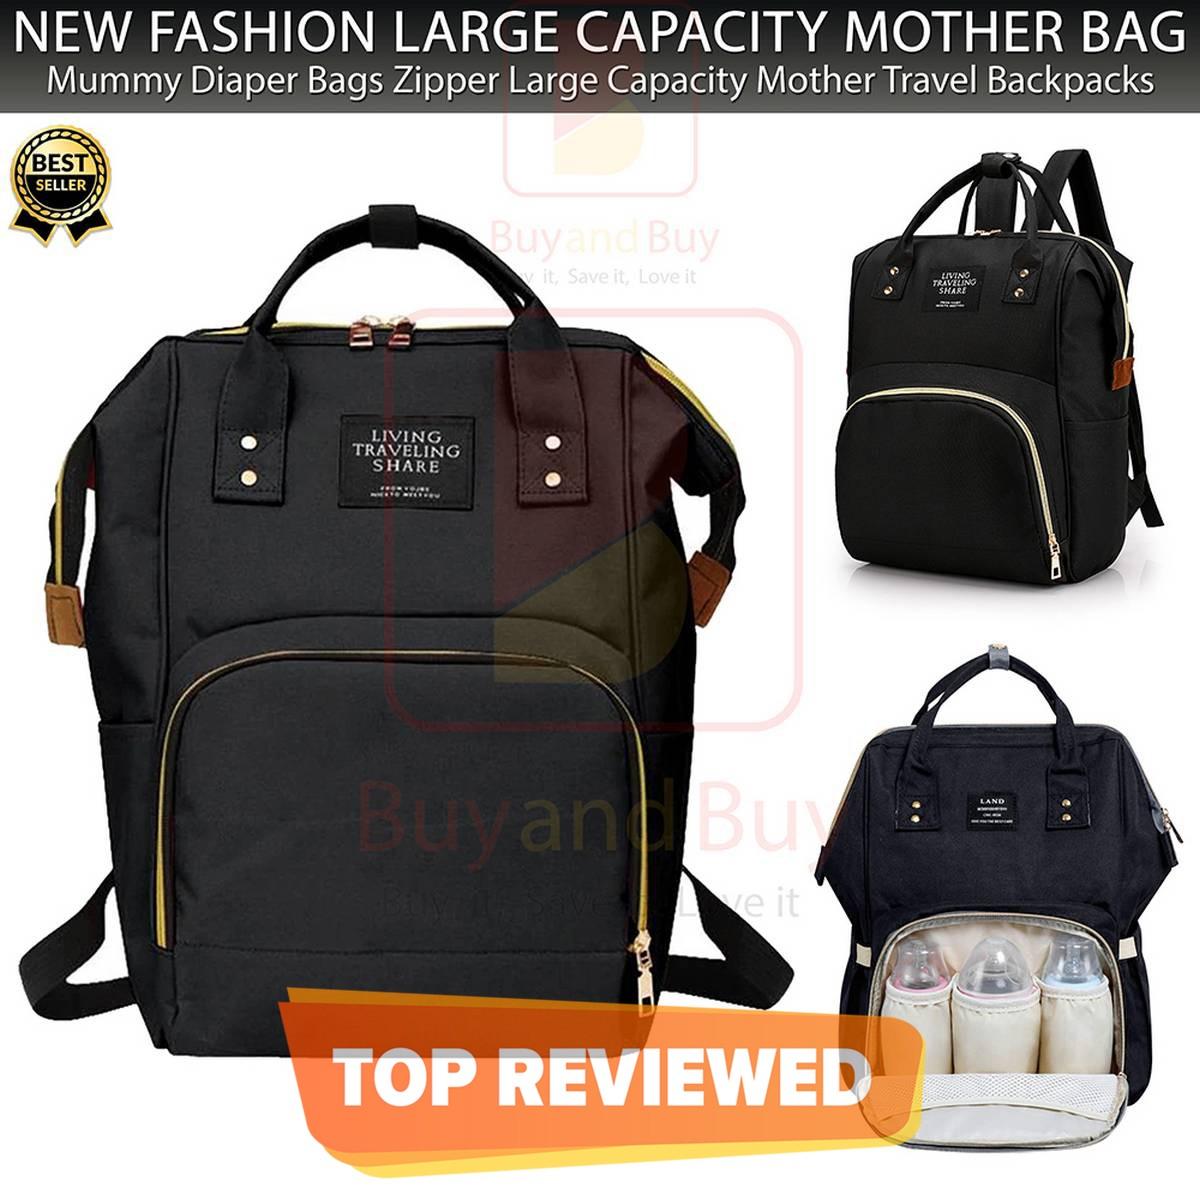 Diaper Mummy Bag Multi-Function Waterproof - Travel Backpack